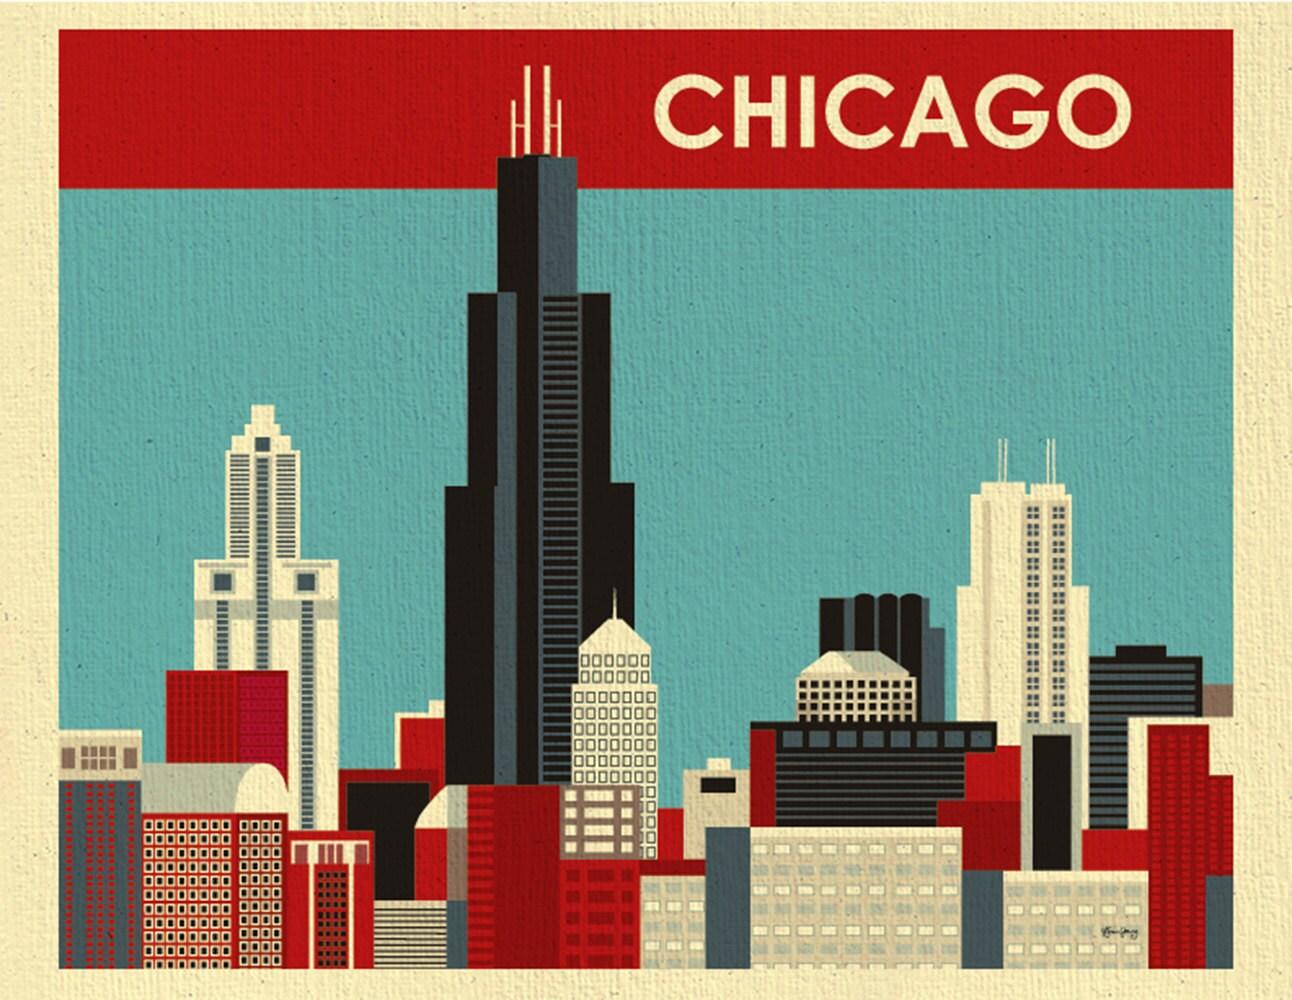 chicago skyline art - photo #17